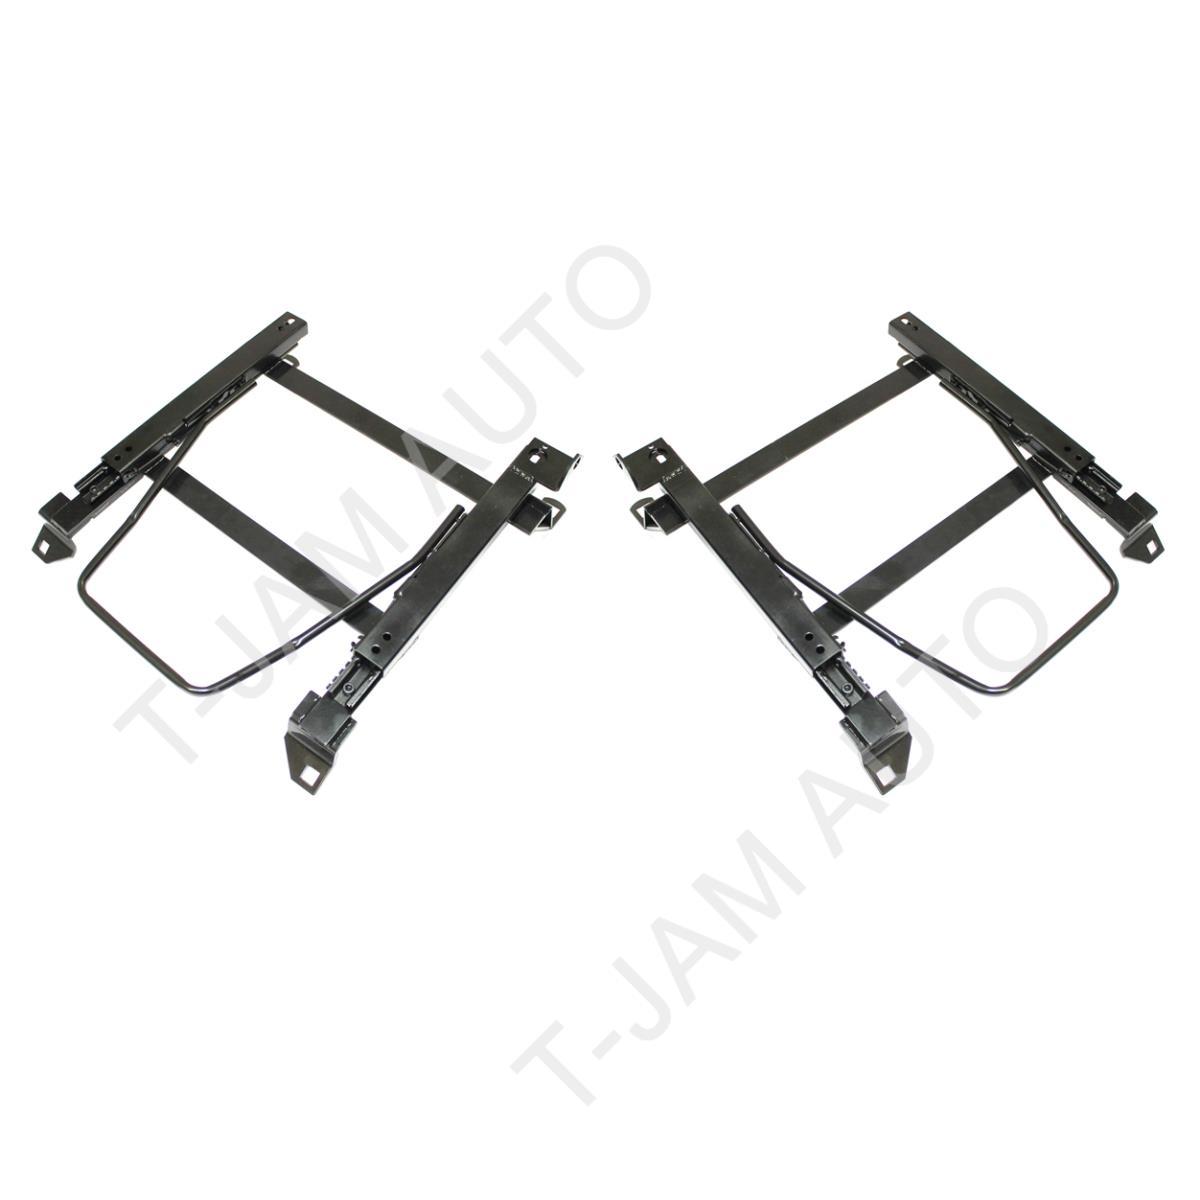 Seat Rail Adaptor Pair 4x4 4WD Toyota Landcruiser 100